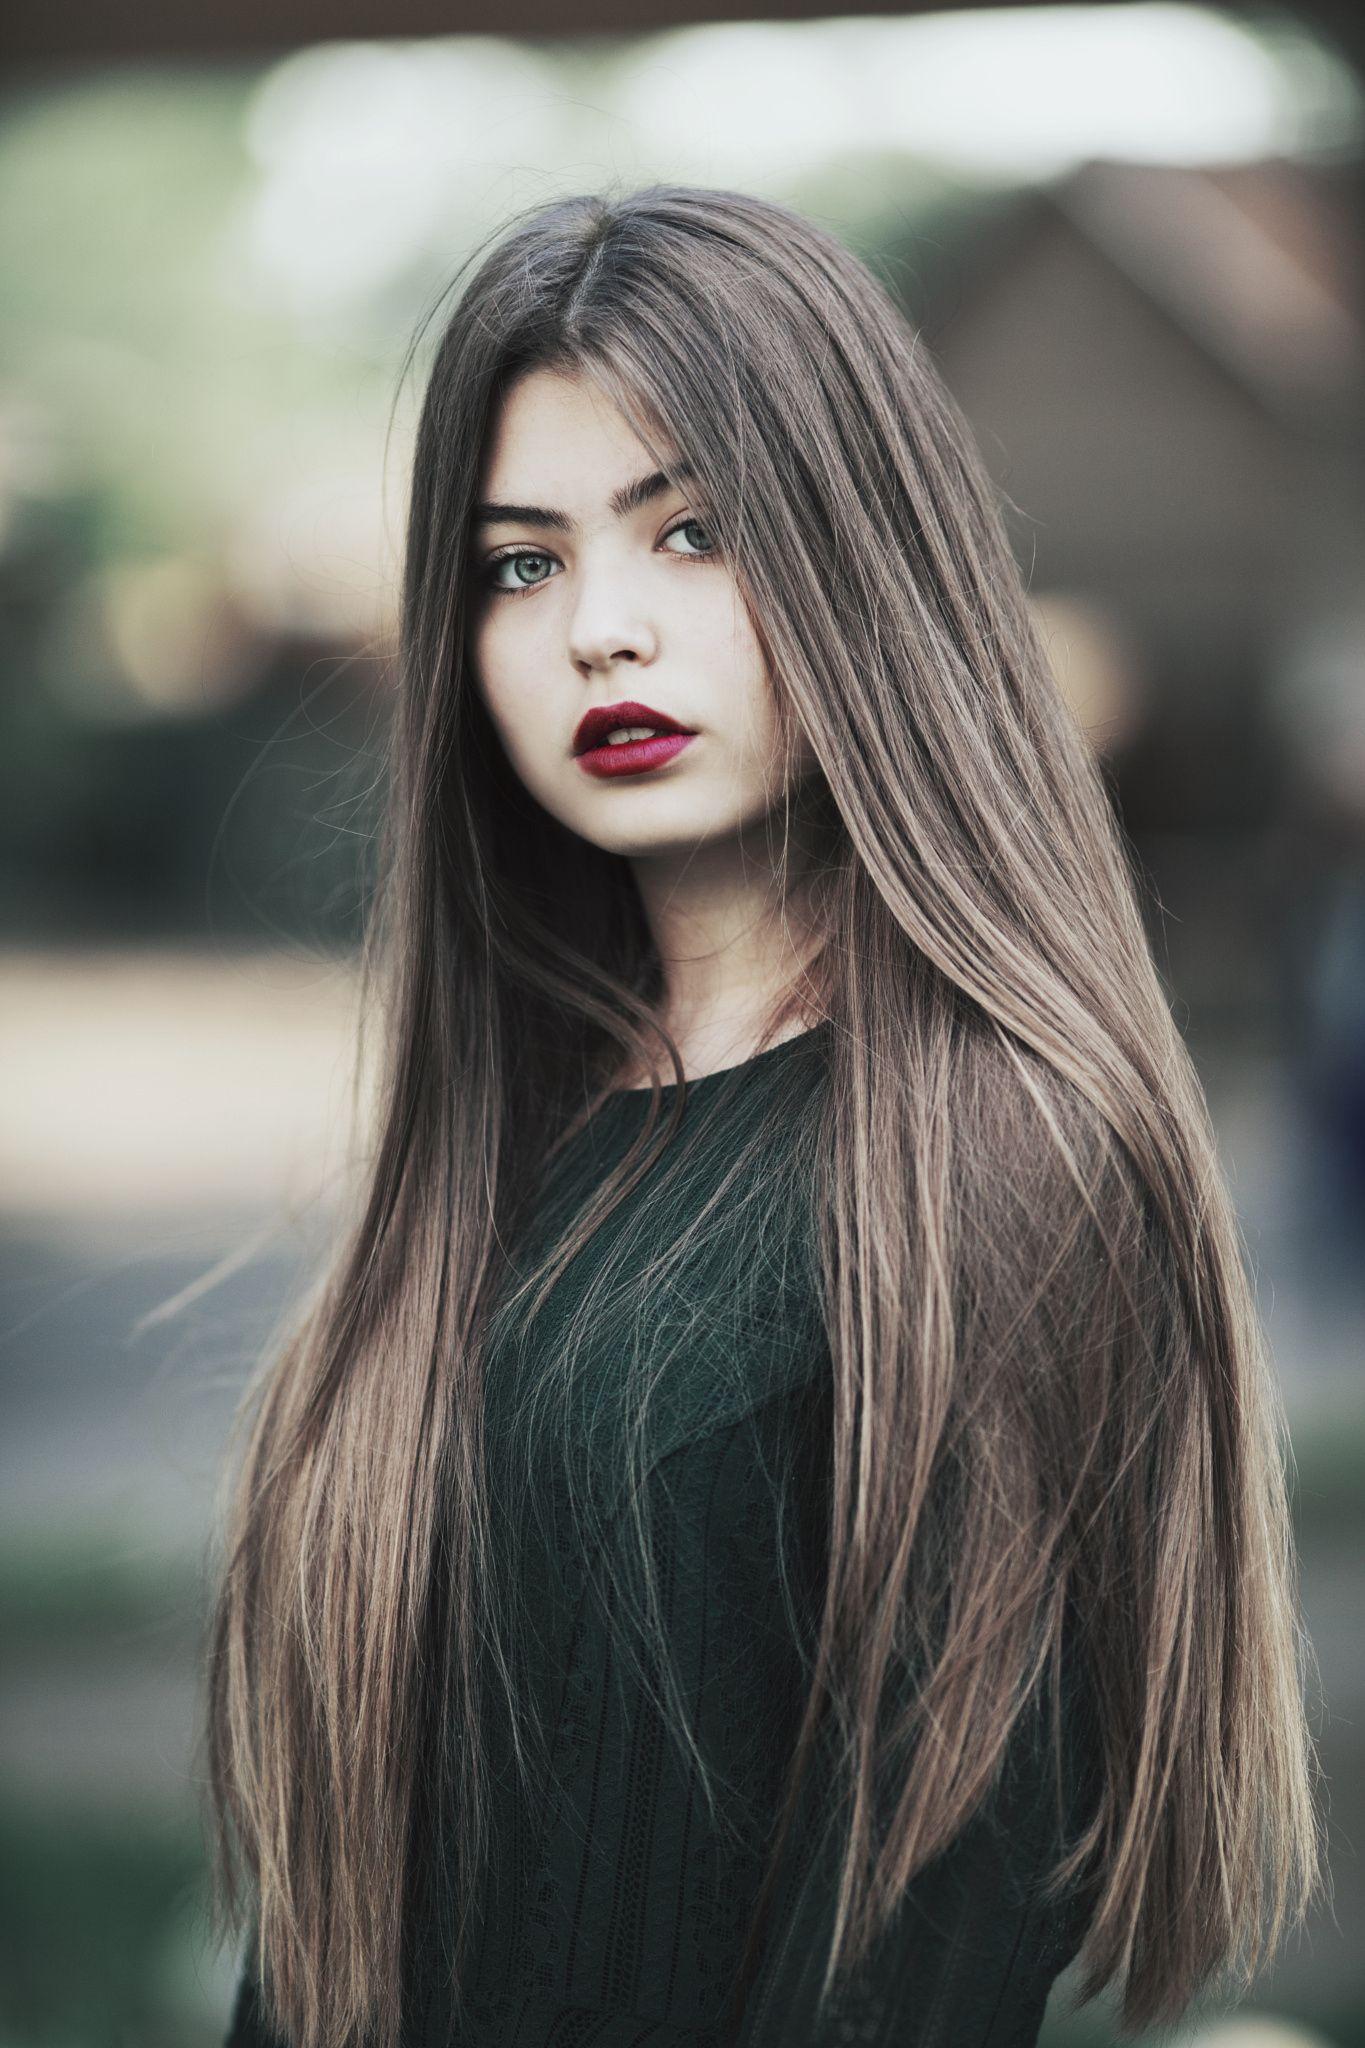 Girl Beauty Beauty Girl Beautiful Long Hair Portrait Girl